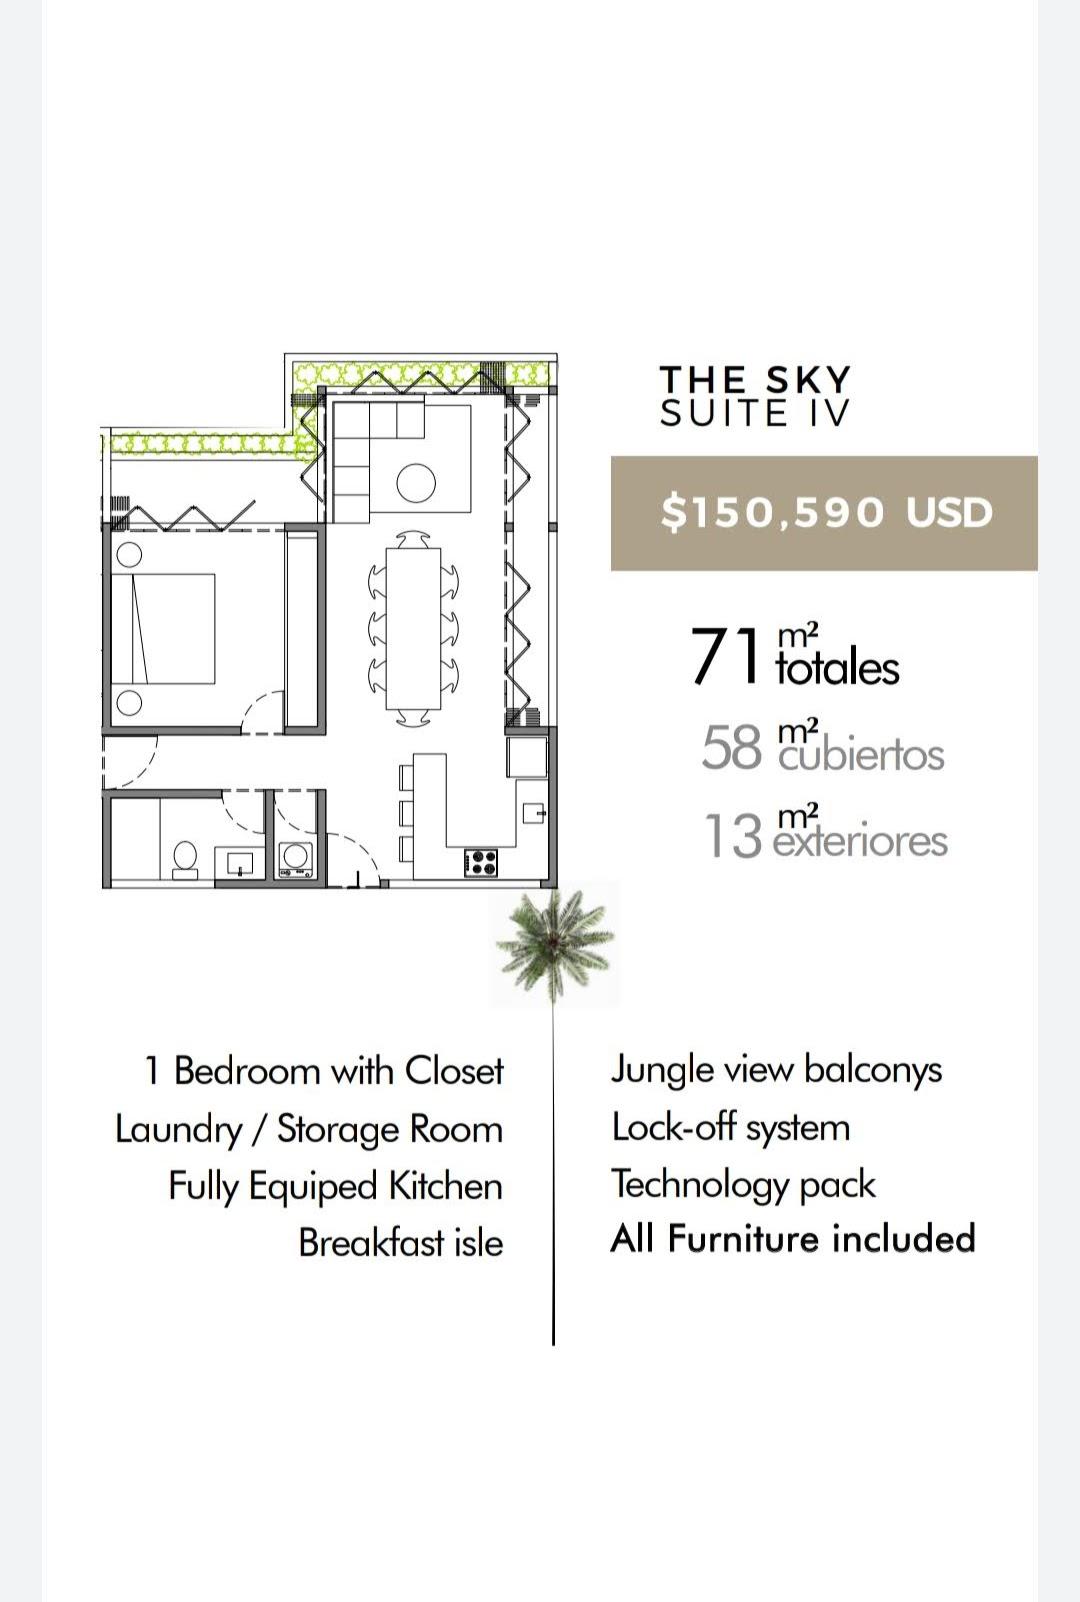 The Sky Suite IV